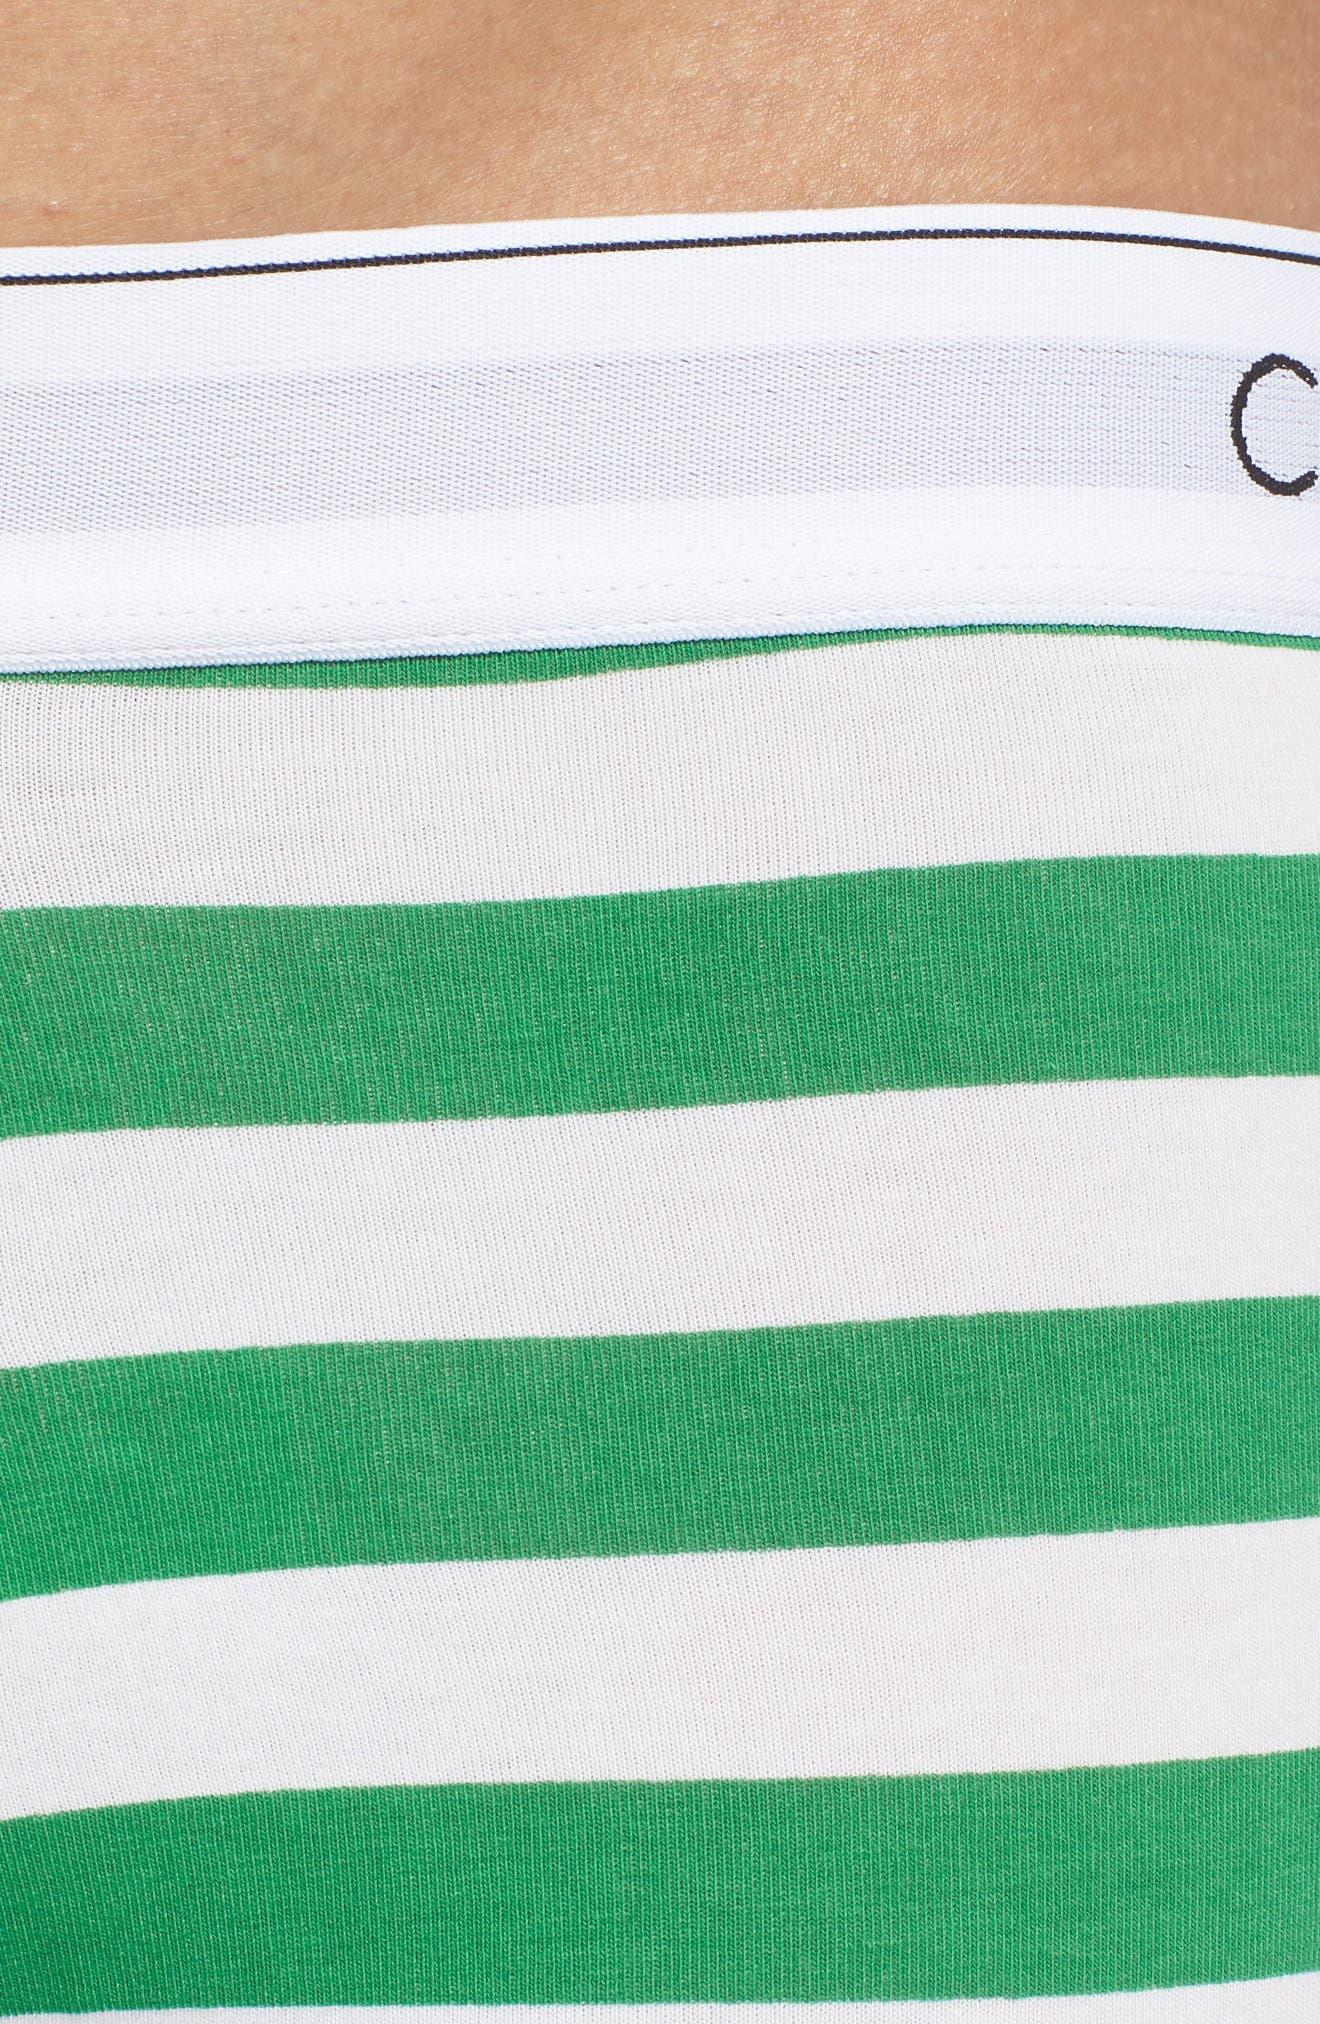 Stripe Trunks,                             Alternate thumbnail 4, color,                             PURE CERULEAN/ GREEN STIPE